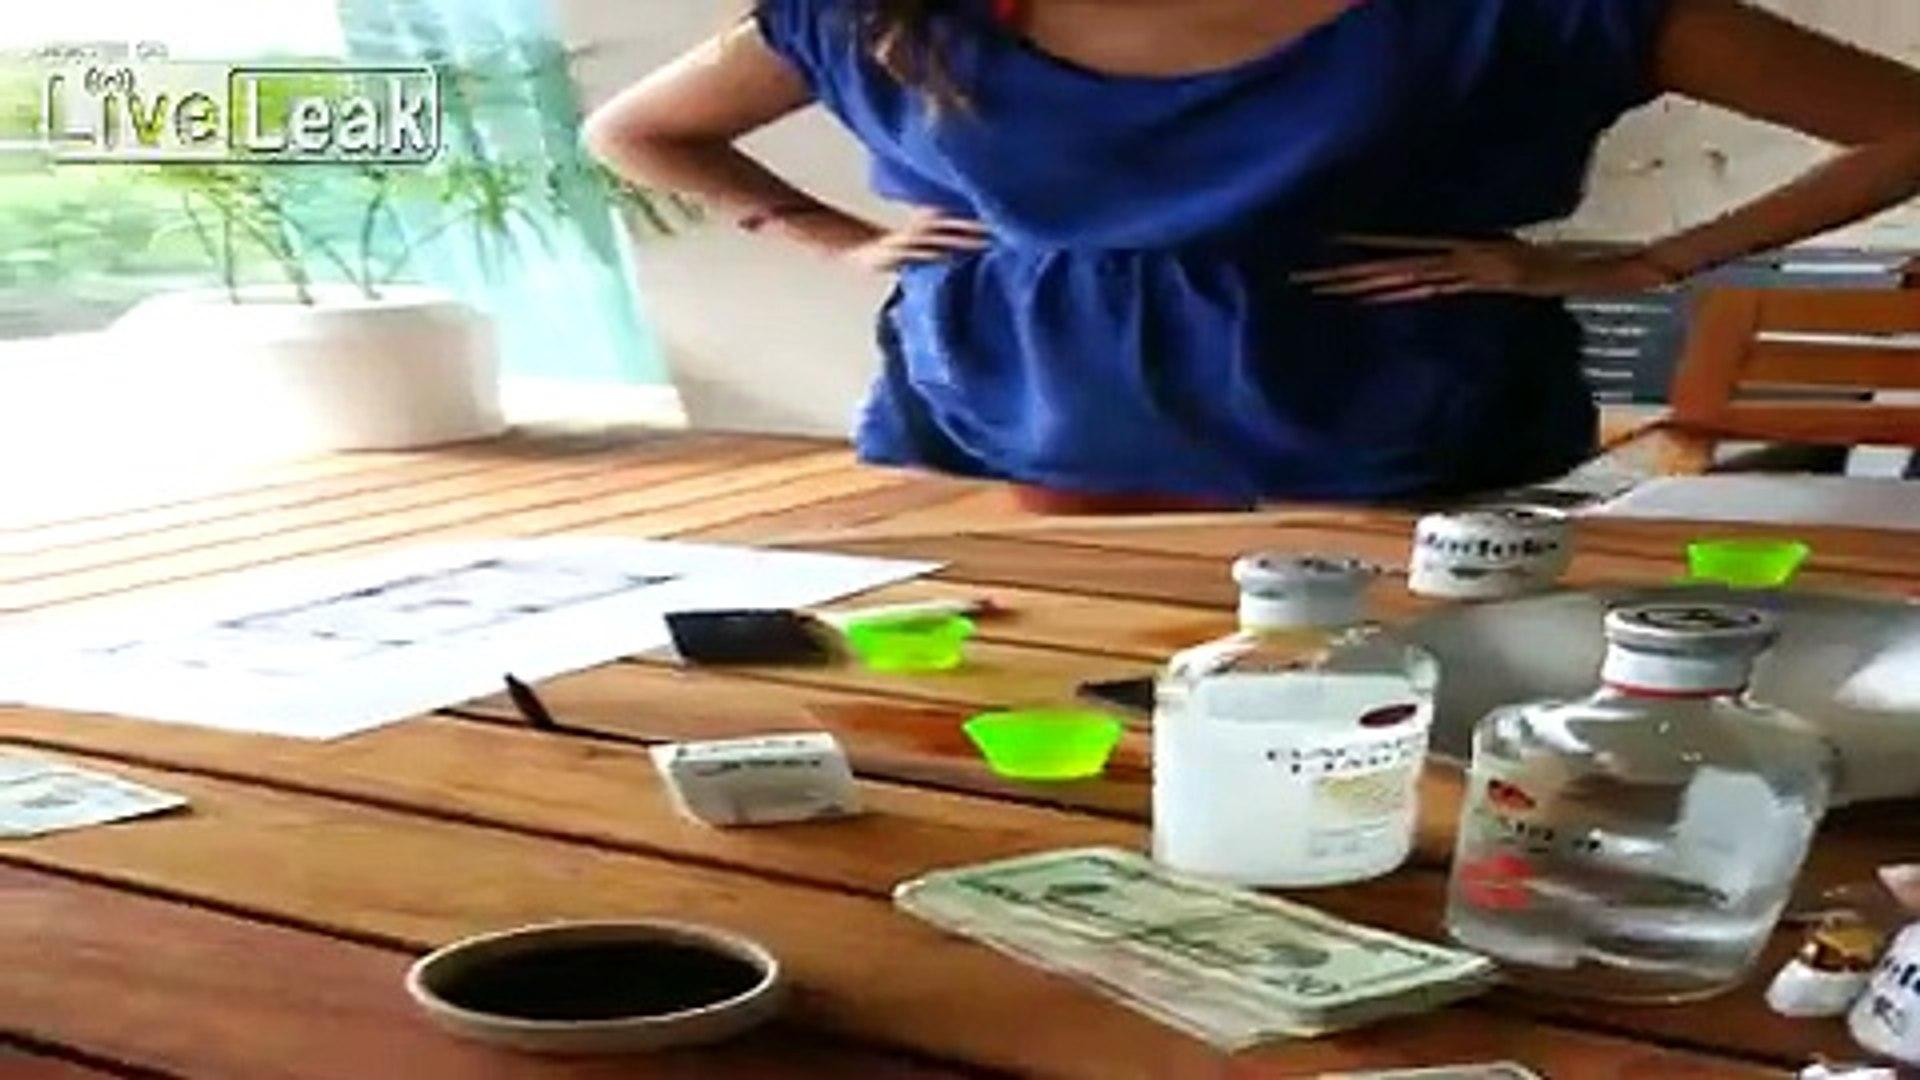 LiveLeak com - girl drinks ashtray liquid